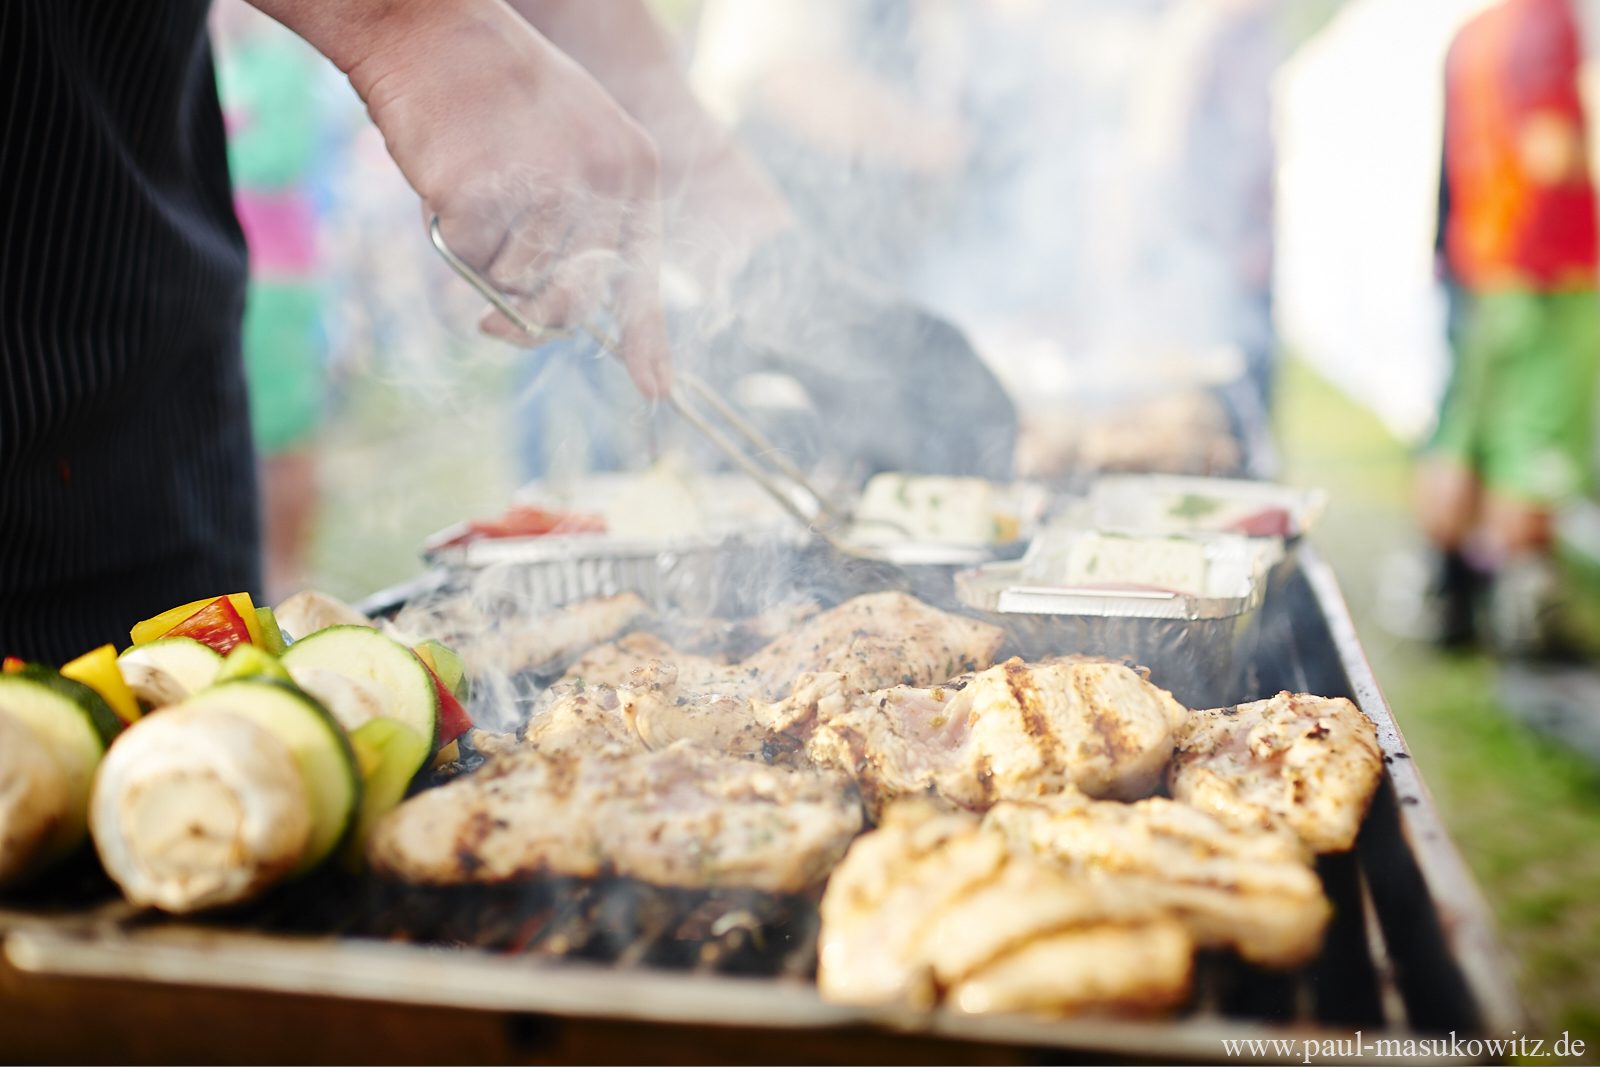 TrailTrophy in Rabenberg - Barbecue am Abend für ca. 250 hungrige Mäuler